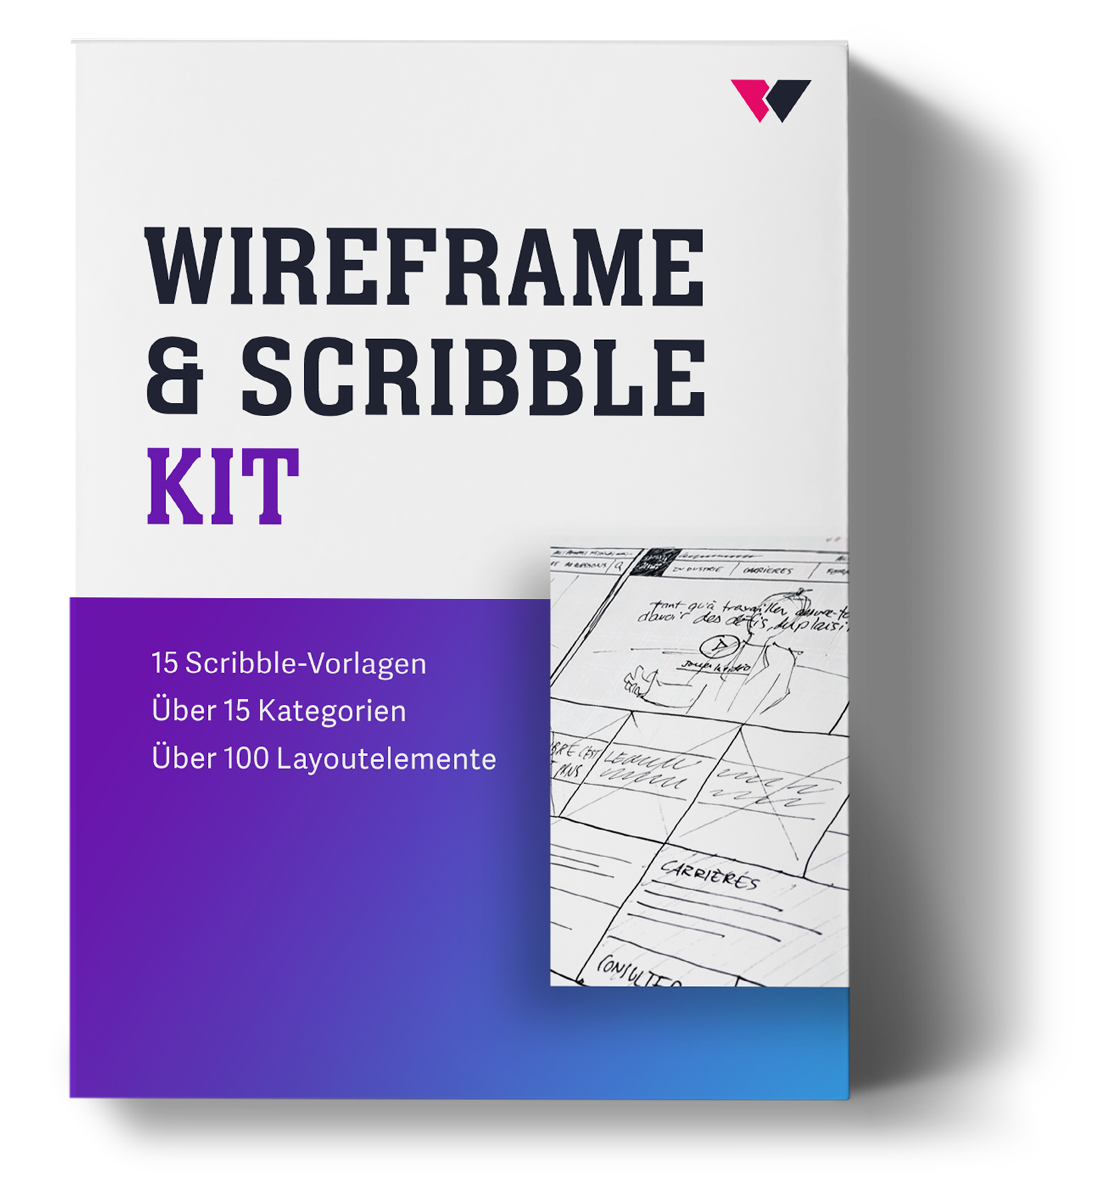 Wireframe Kit Dankesseite 7